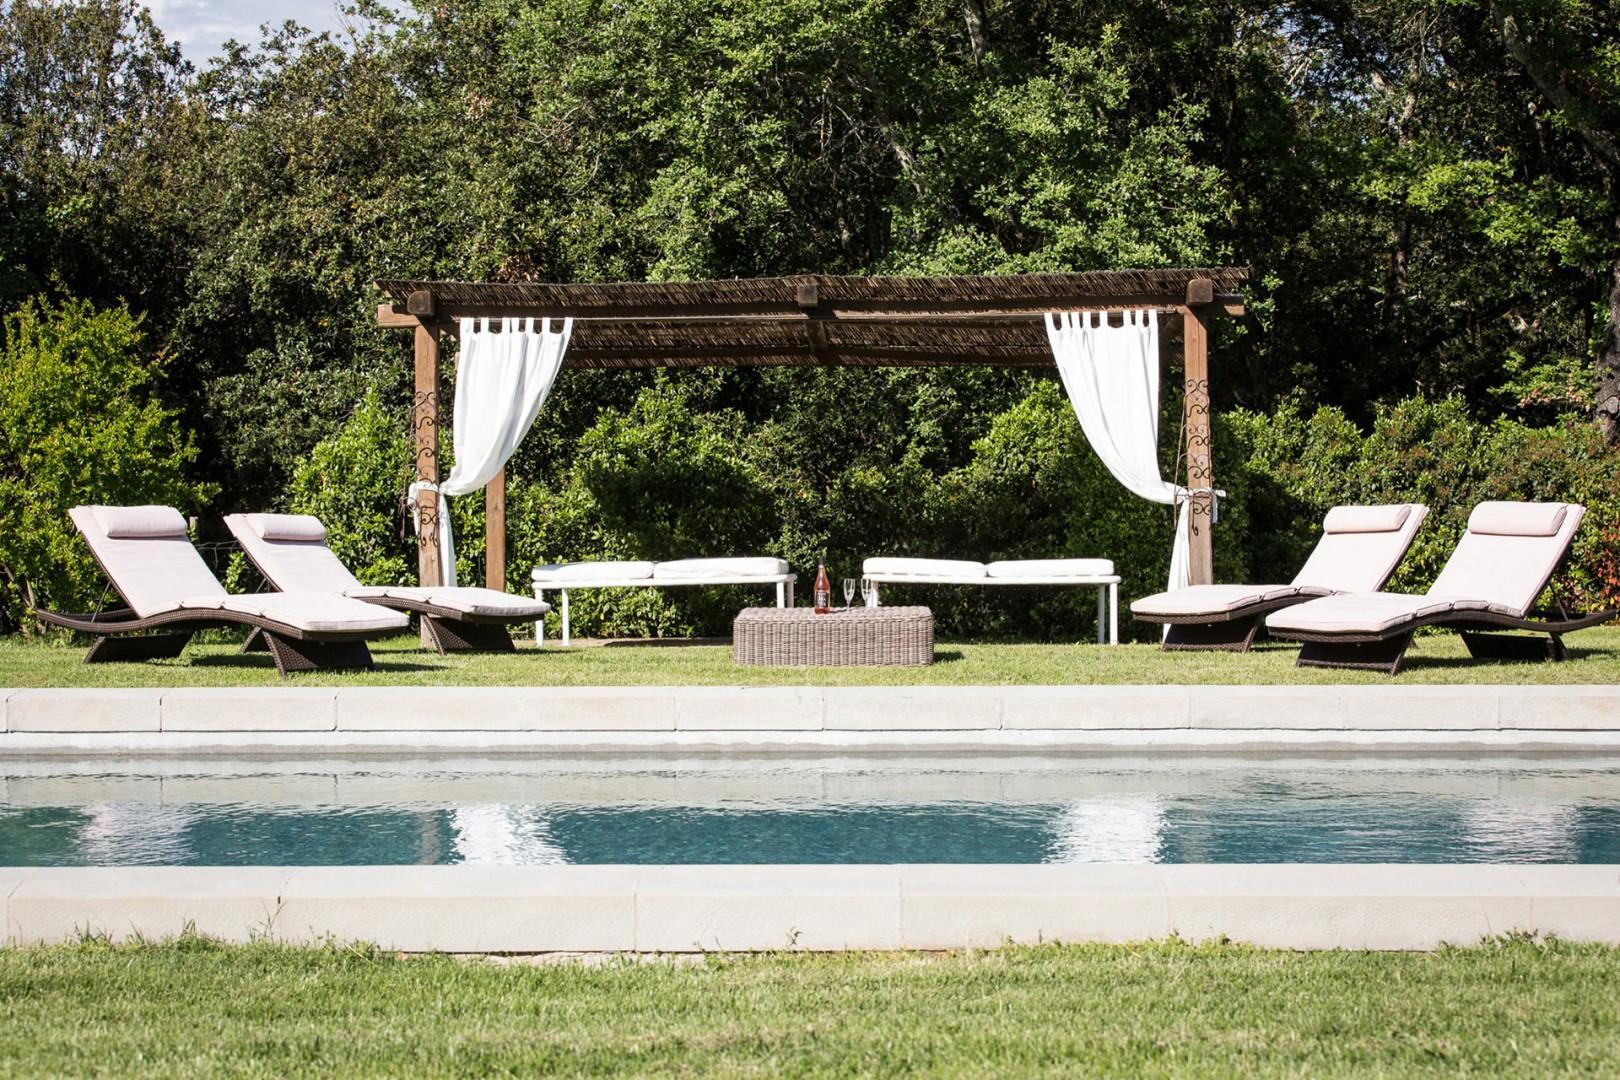 Shady pergola by the pool.